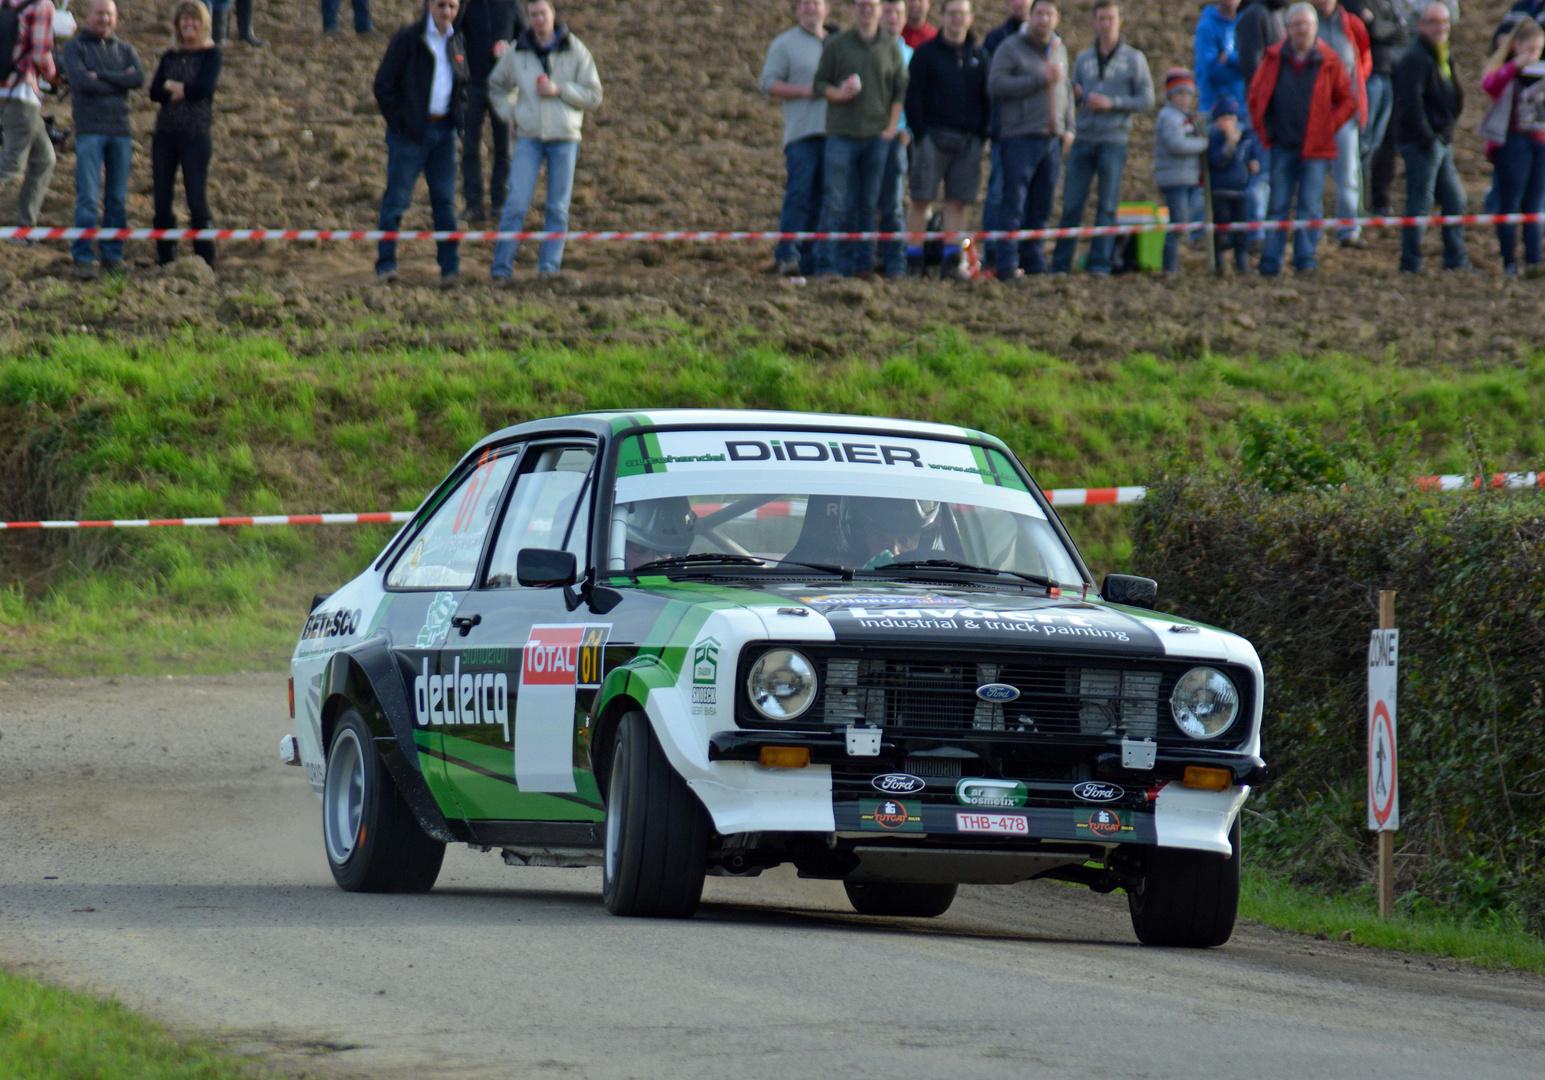 Rallye Auto Legende Part I Foto Bild Sport Motorsport